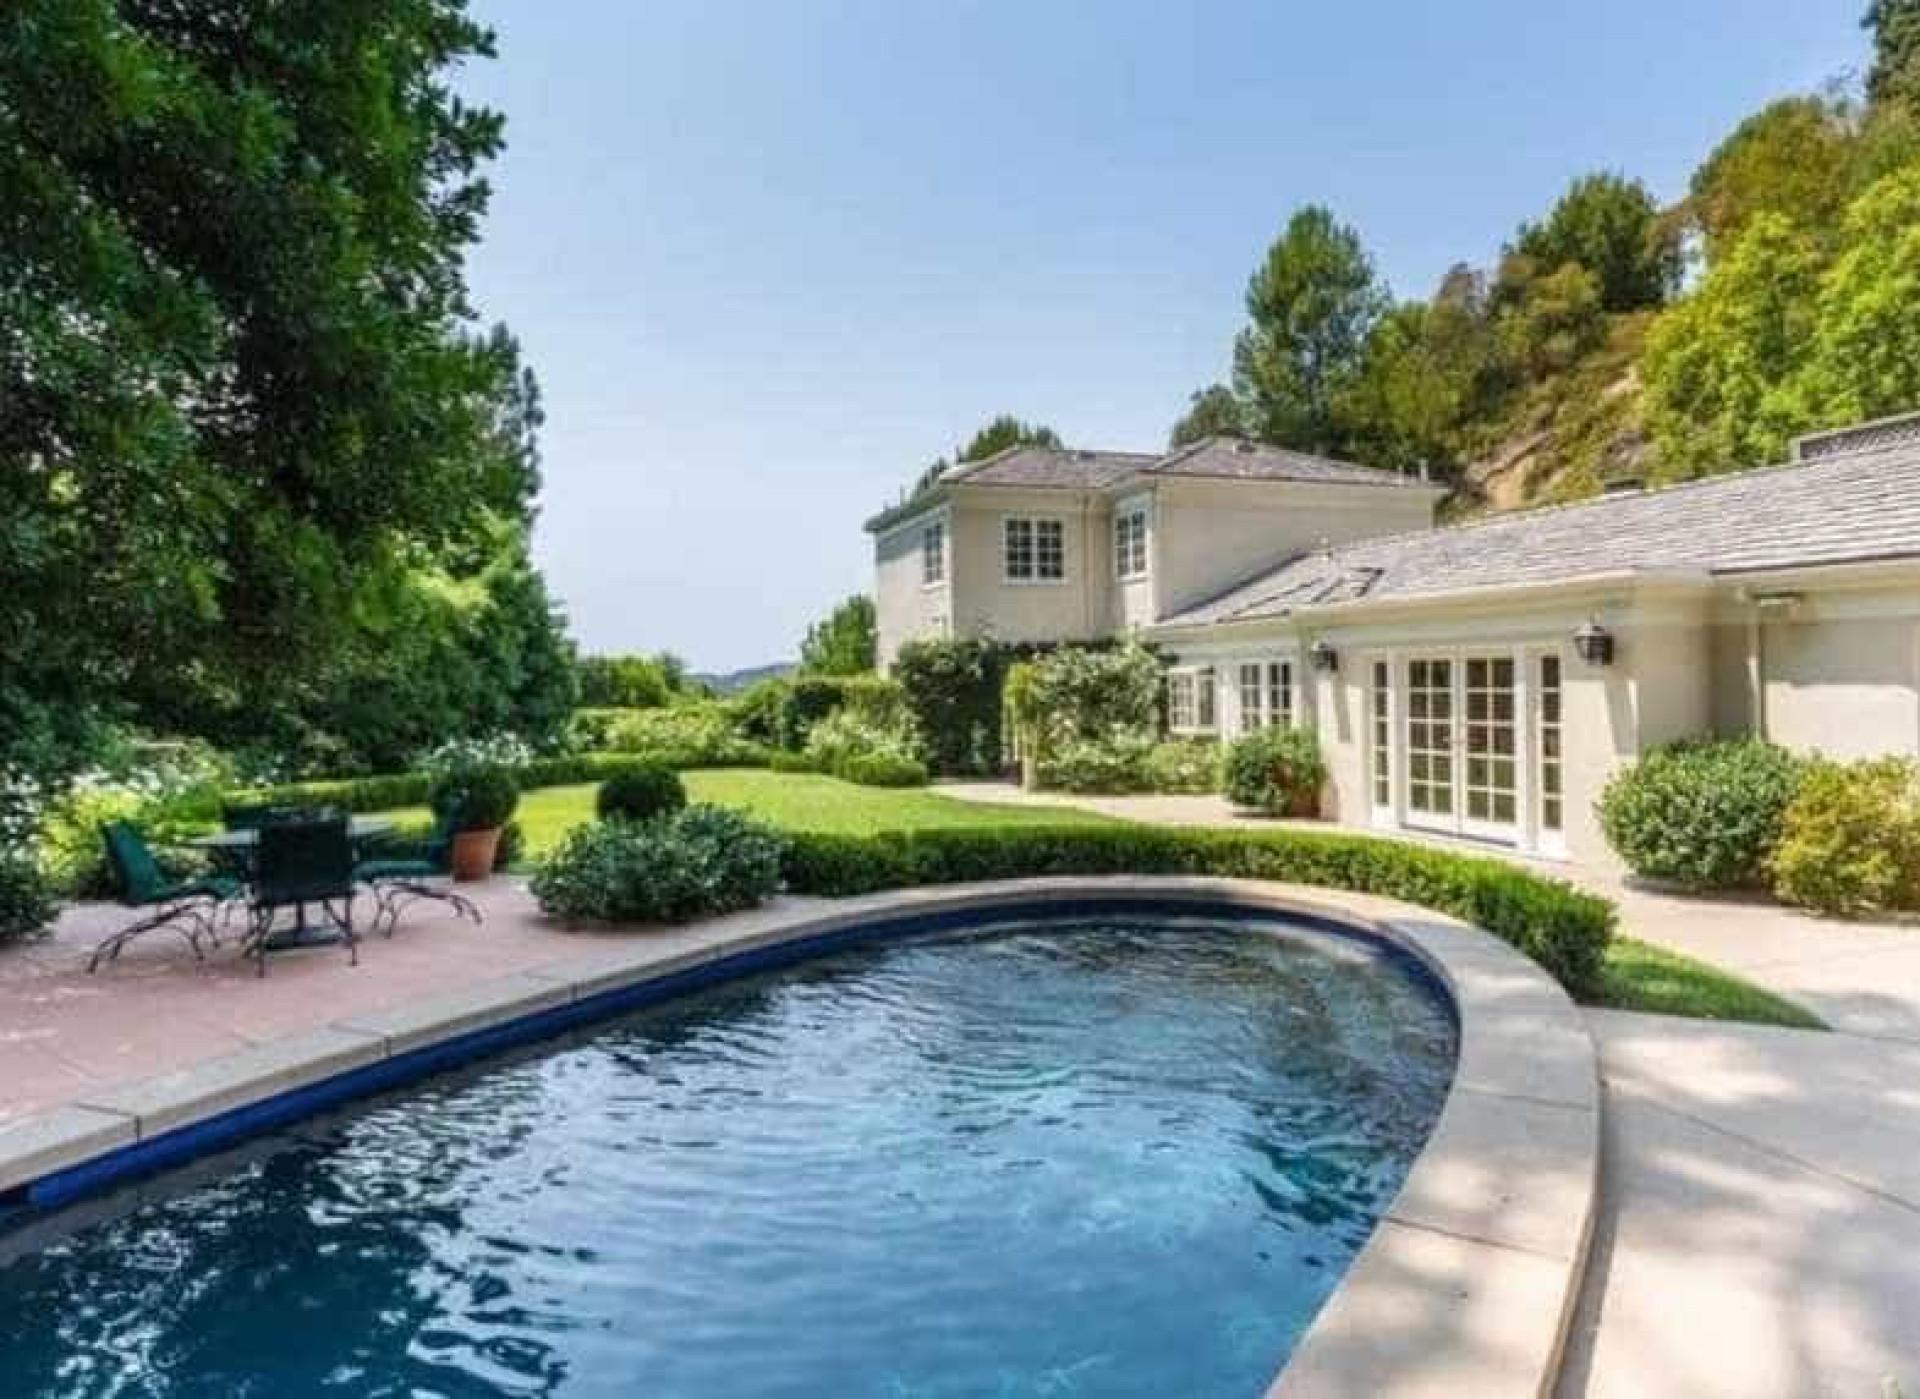 Katy Perry compra casa de R$ 27 milhões para receber visitas; fotos